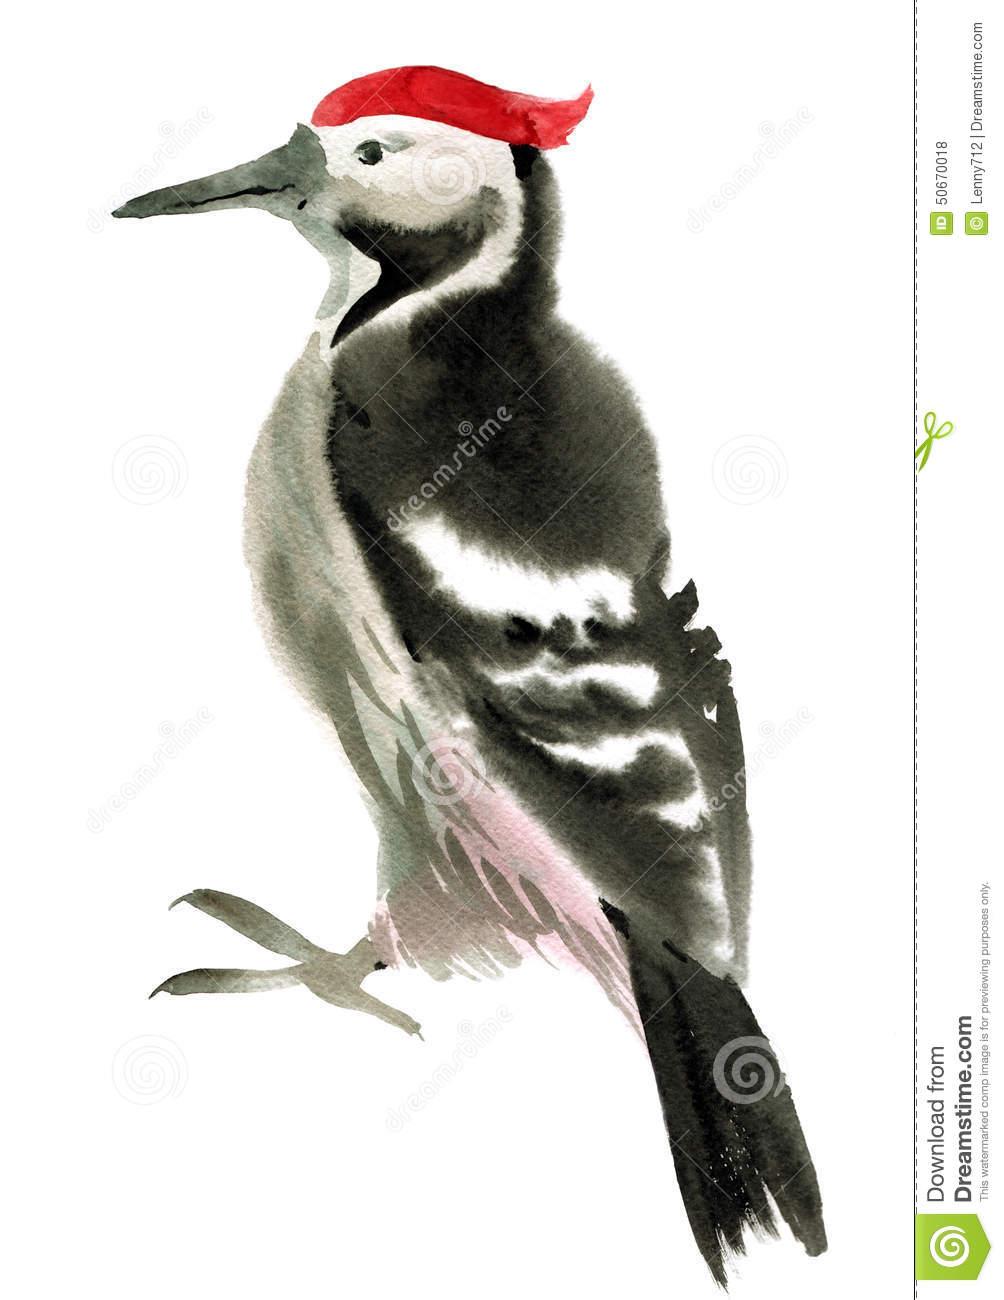 Watercolor Illustration Of Woodpecker Stock Photo.